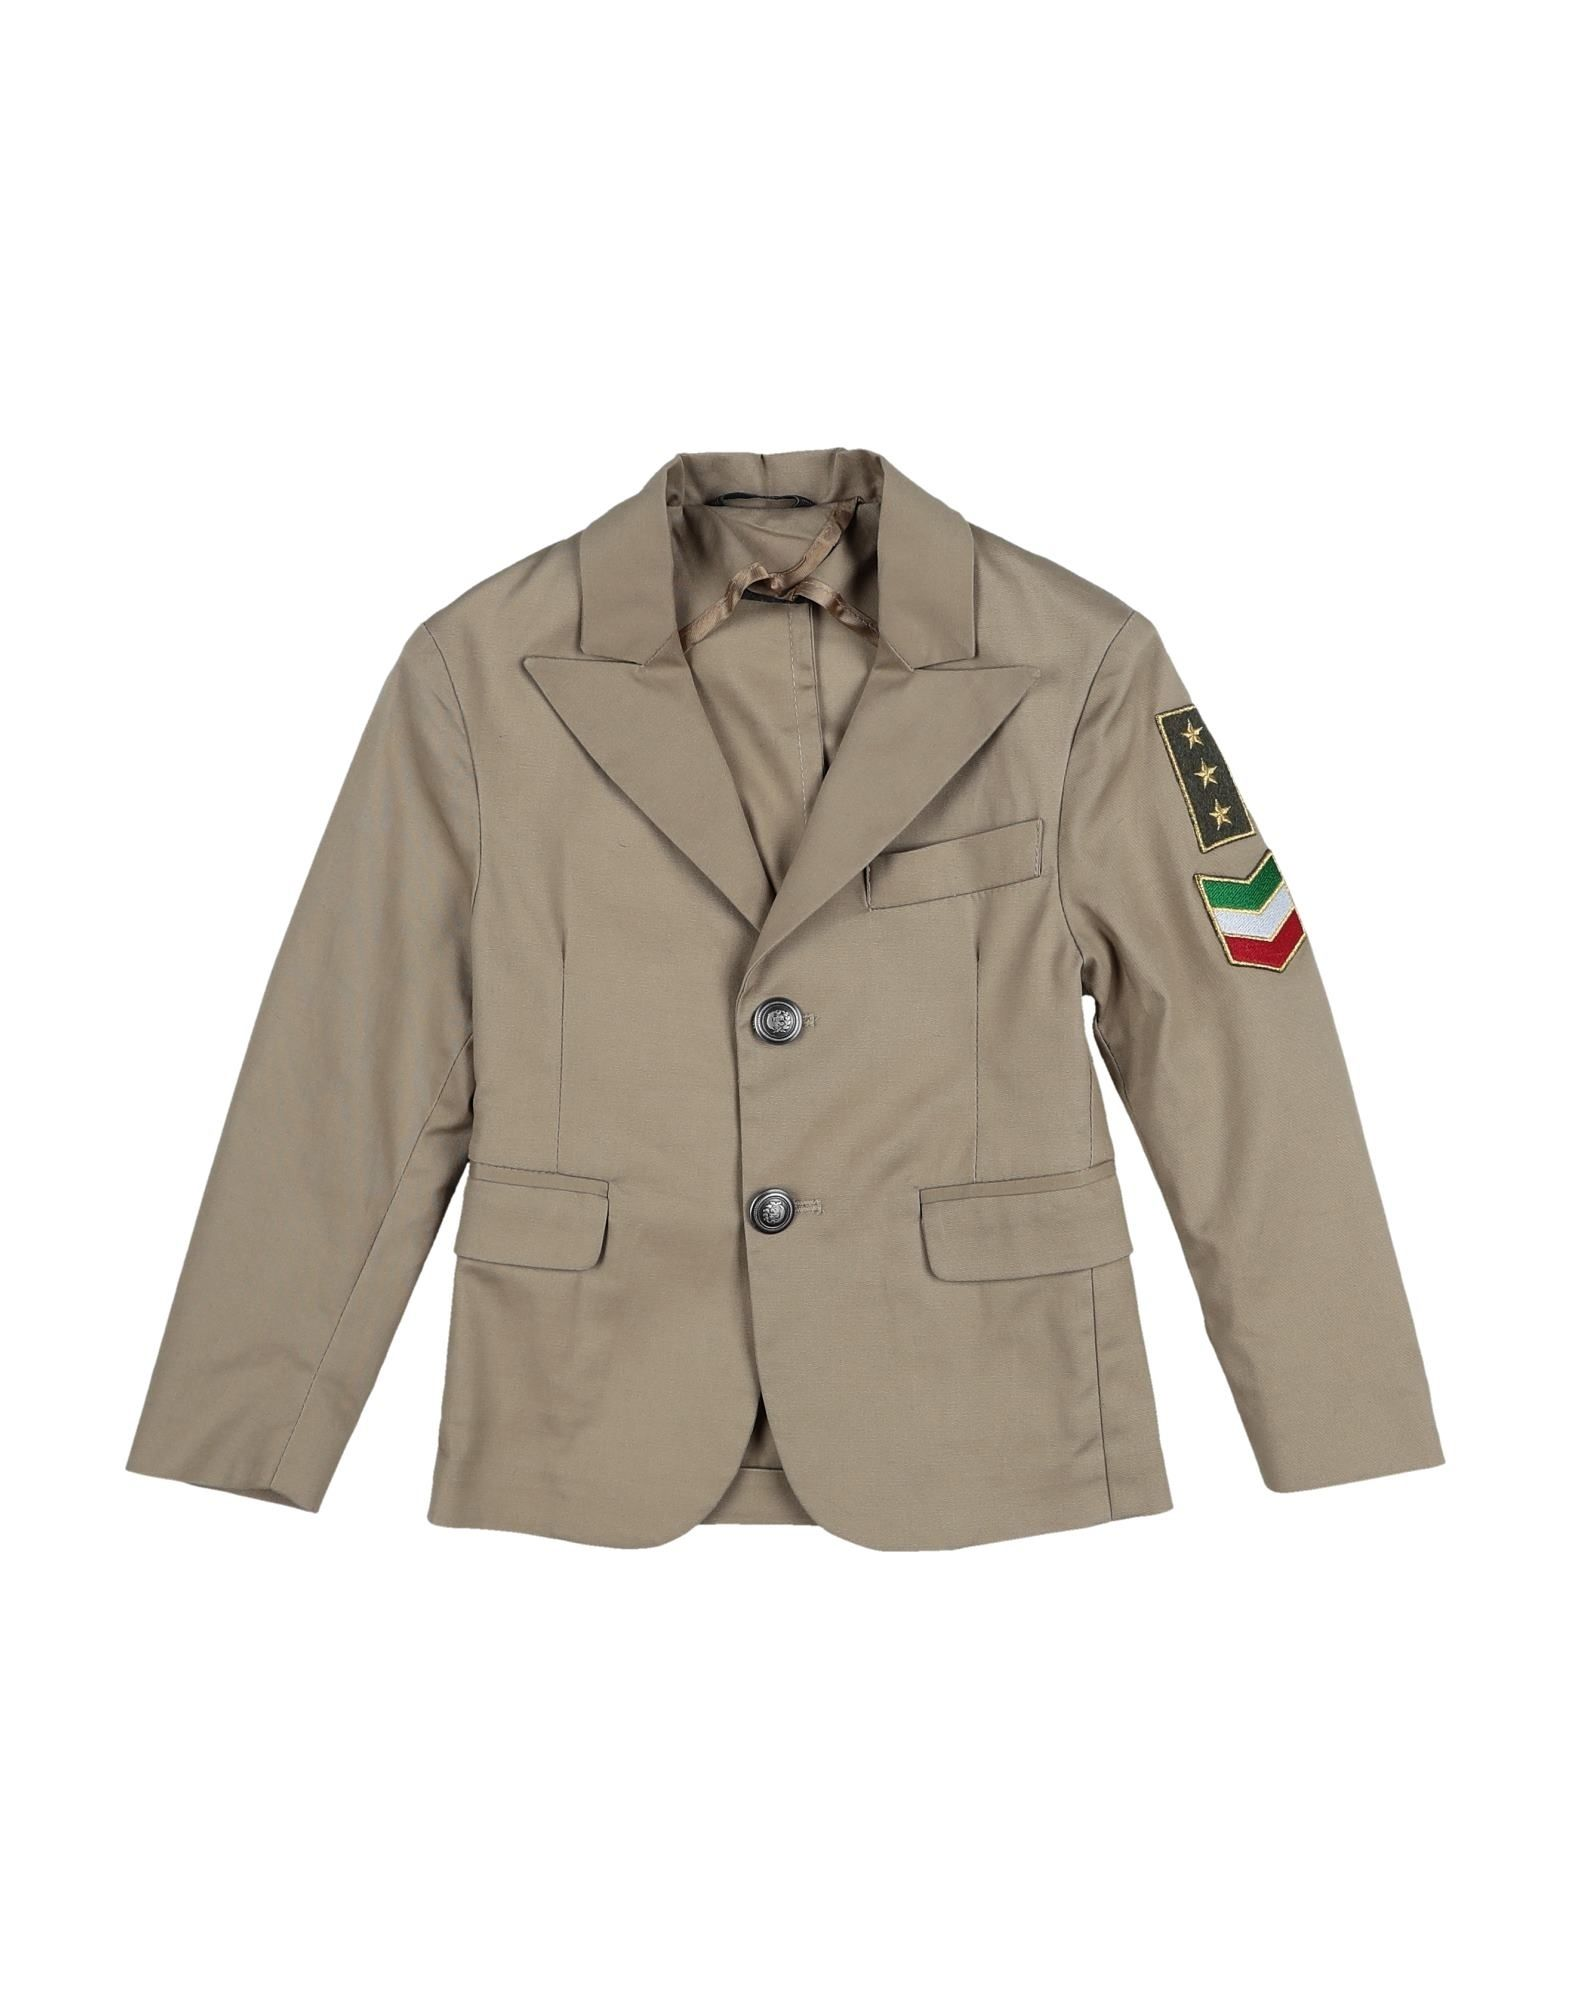 26.7 Twentysixseven Kids' Suit Jackets In Sand